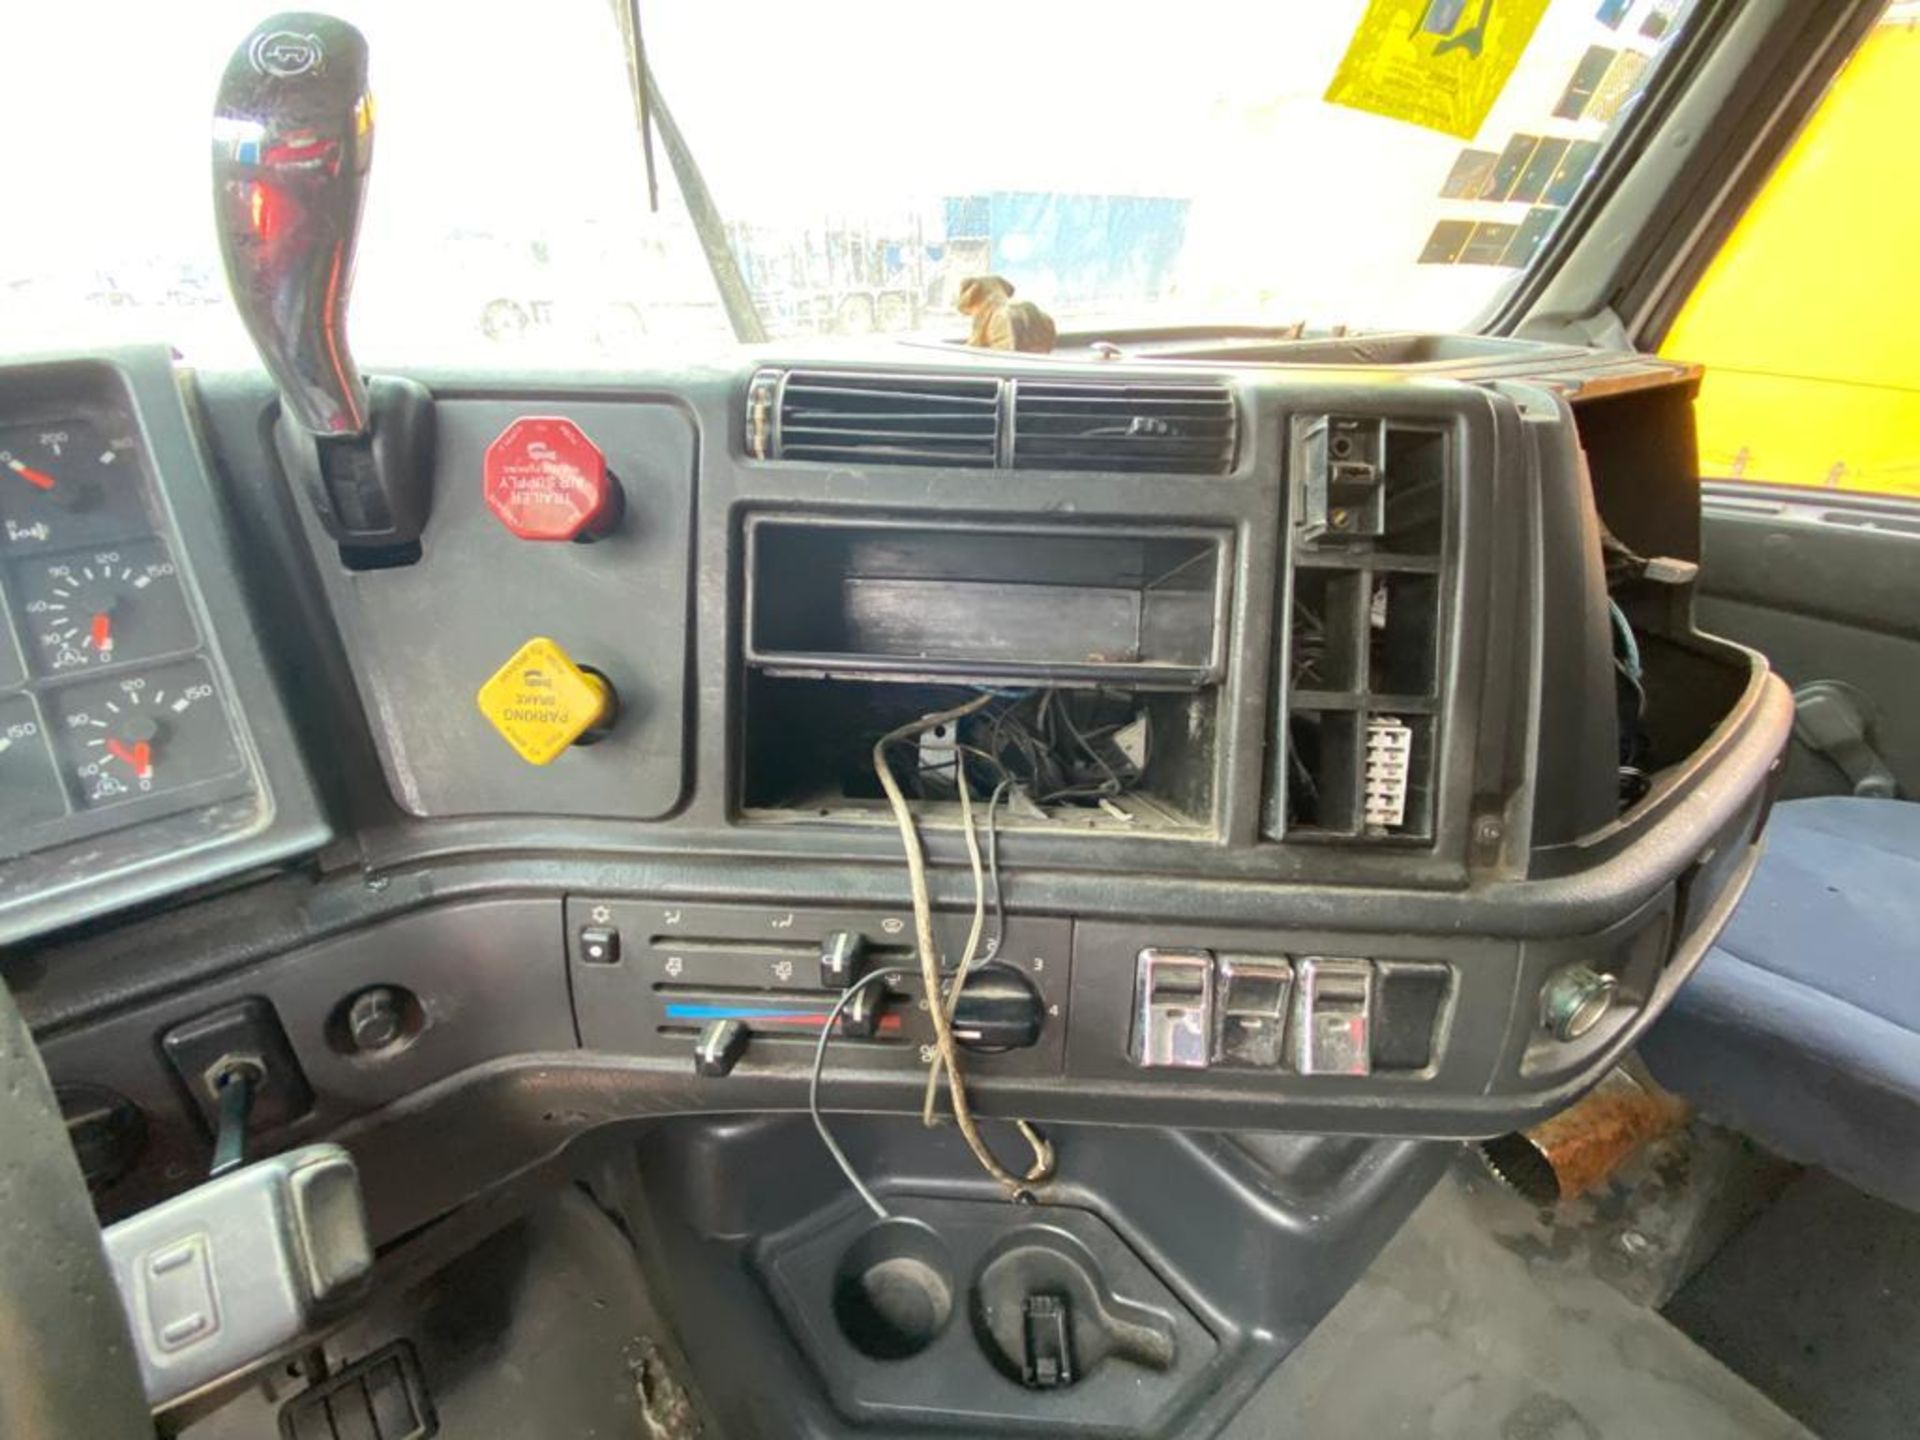 2001 Volvo Sleeper Truck Tractor, estándar transmissión of 18 speeds, with Volvo motor - Image 49 of 60